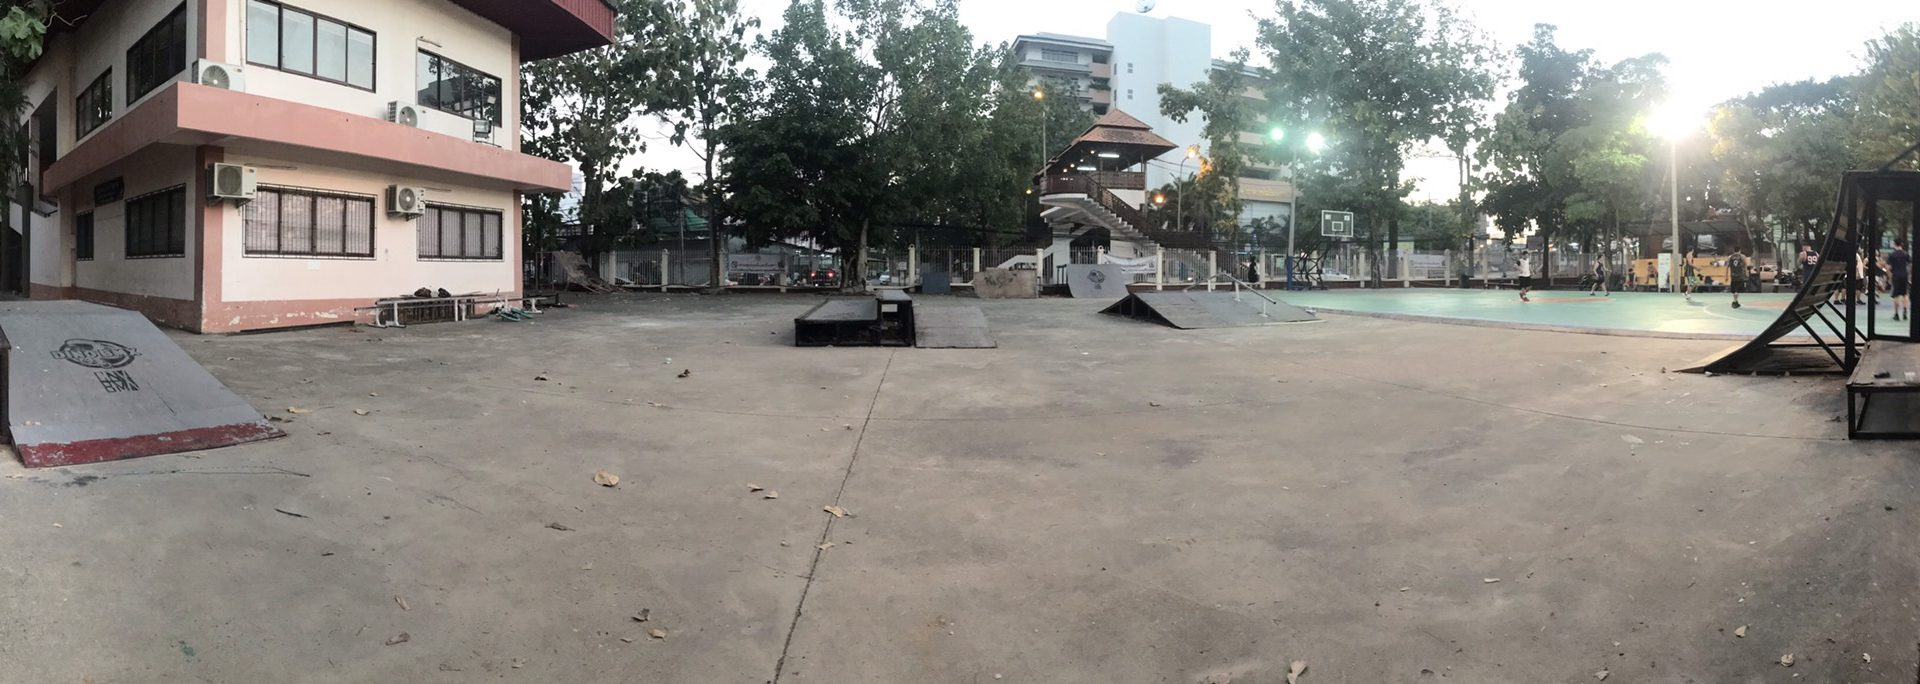 Muang Chiang Mai Stadium BMX Park Bikezilla